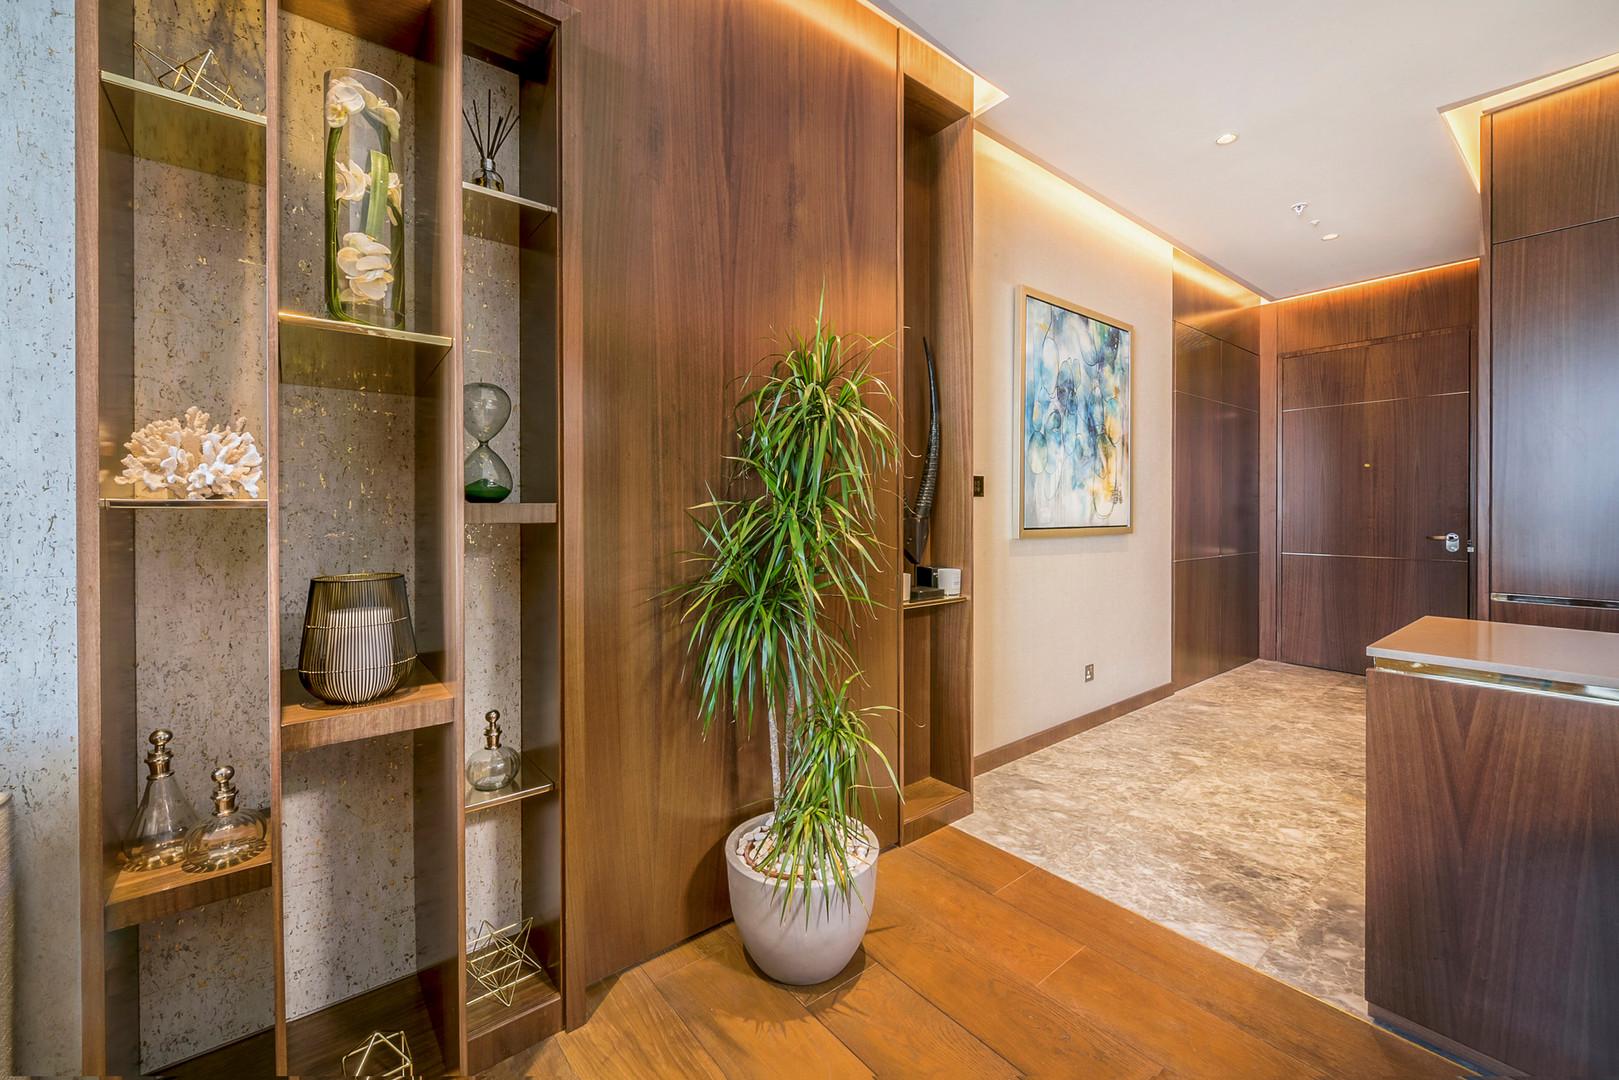 Langham show apartment 8.jpg